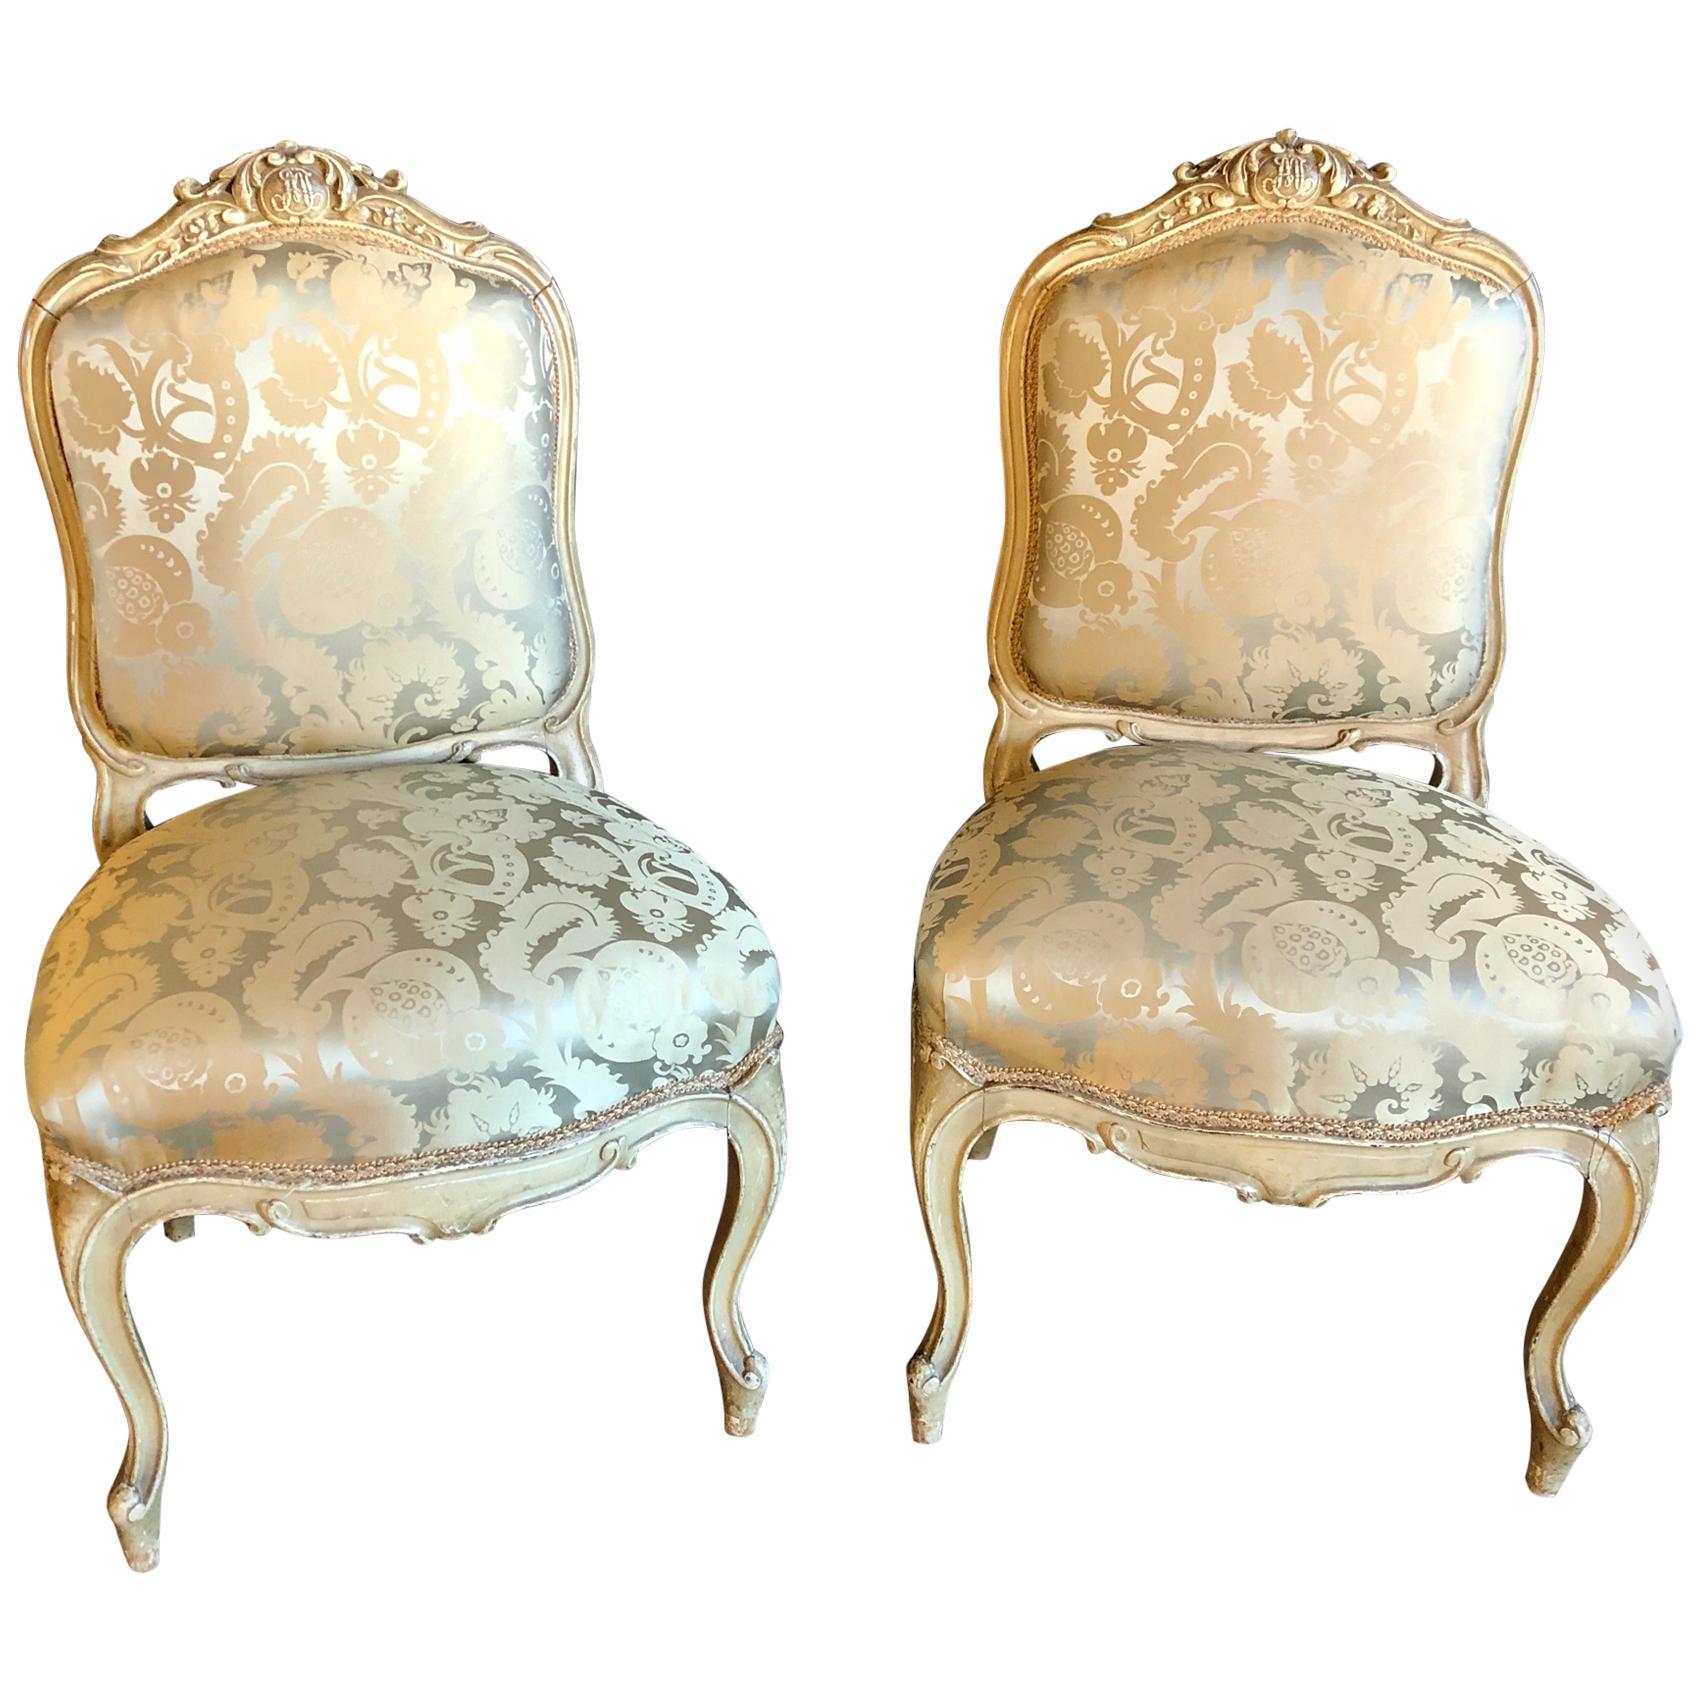 Pair of Maison Jansen Slipper Chairs in Scalamandre Upholstery in Fine Frames